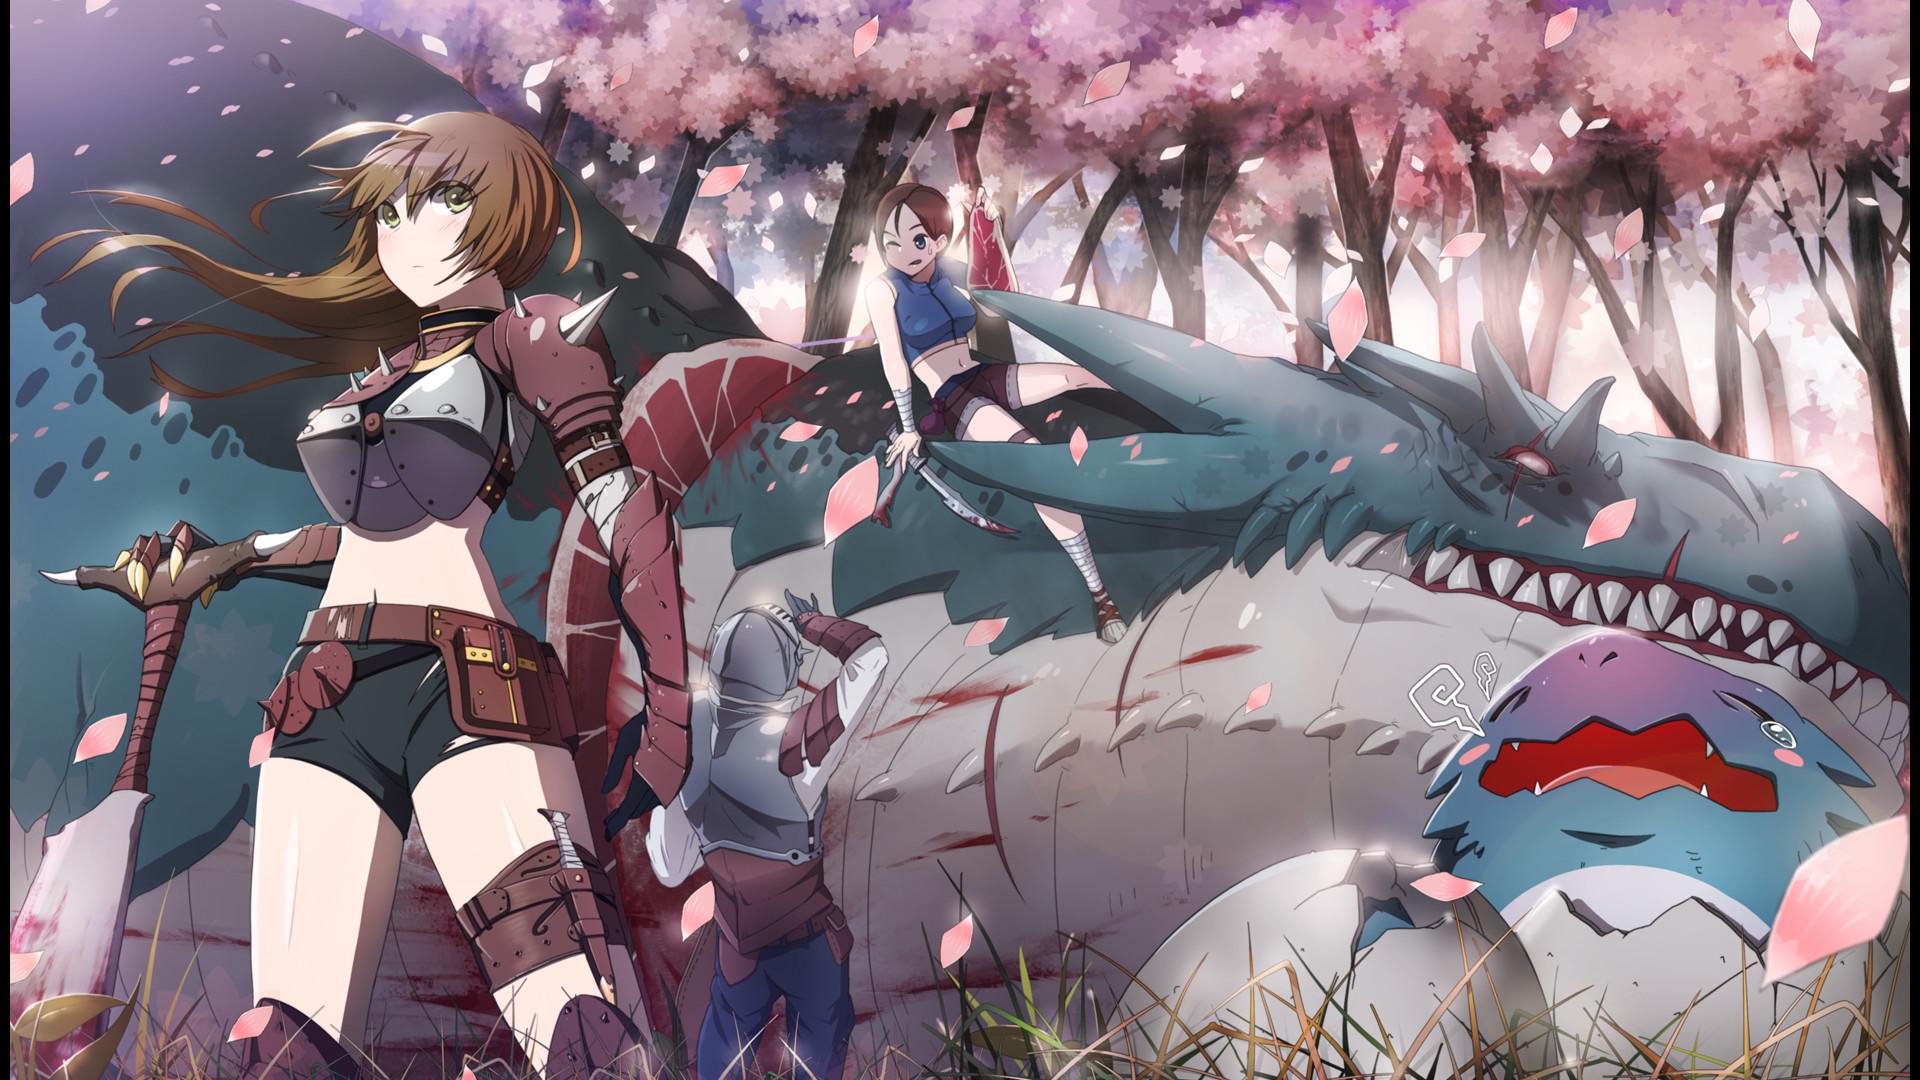 Anime – Original Anime Original (Anime) Mädchen Krieger Drachen Fantasy Cherry  Blossom Weapon Brown